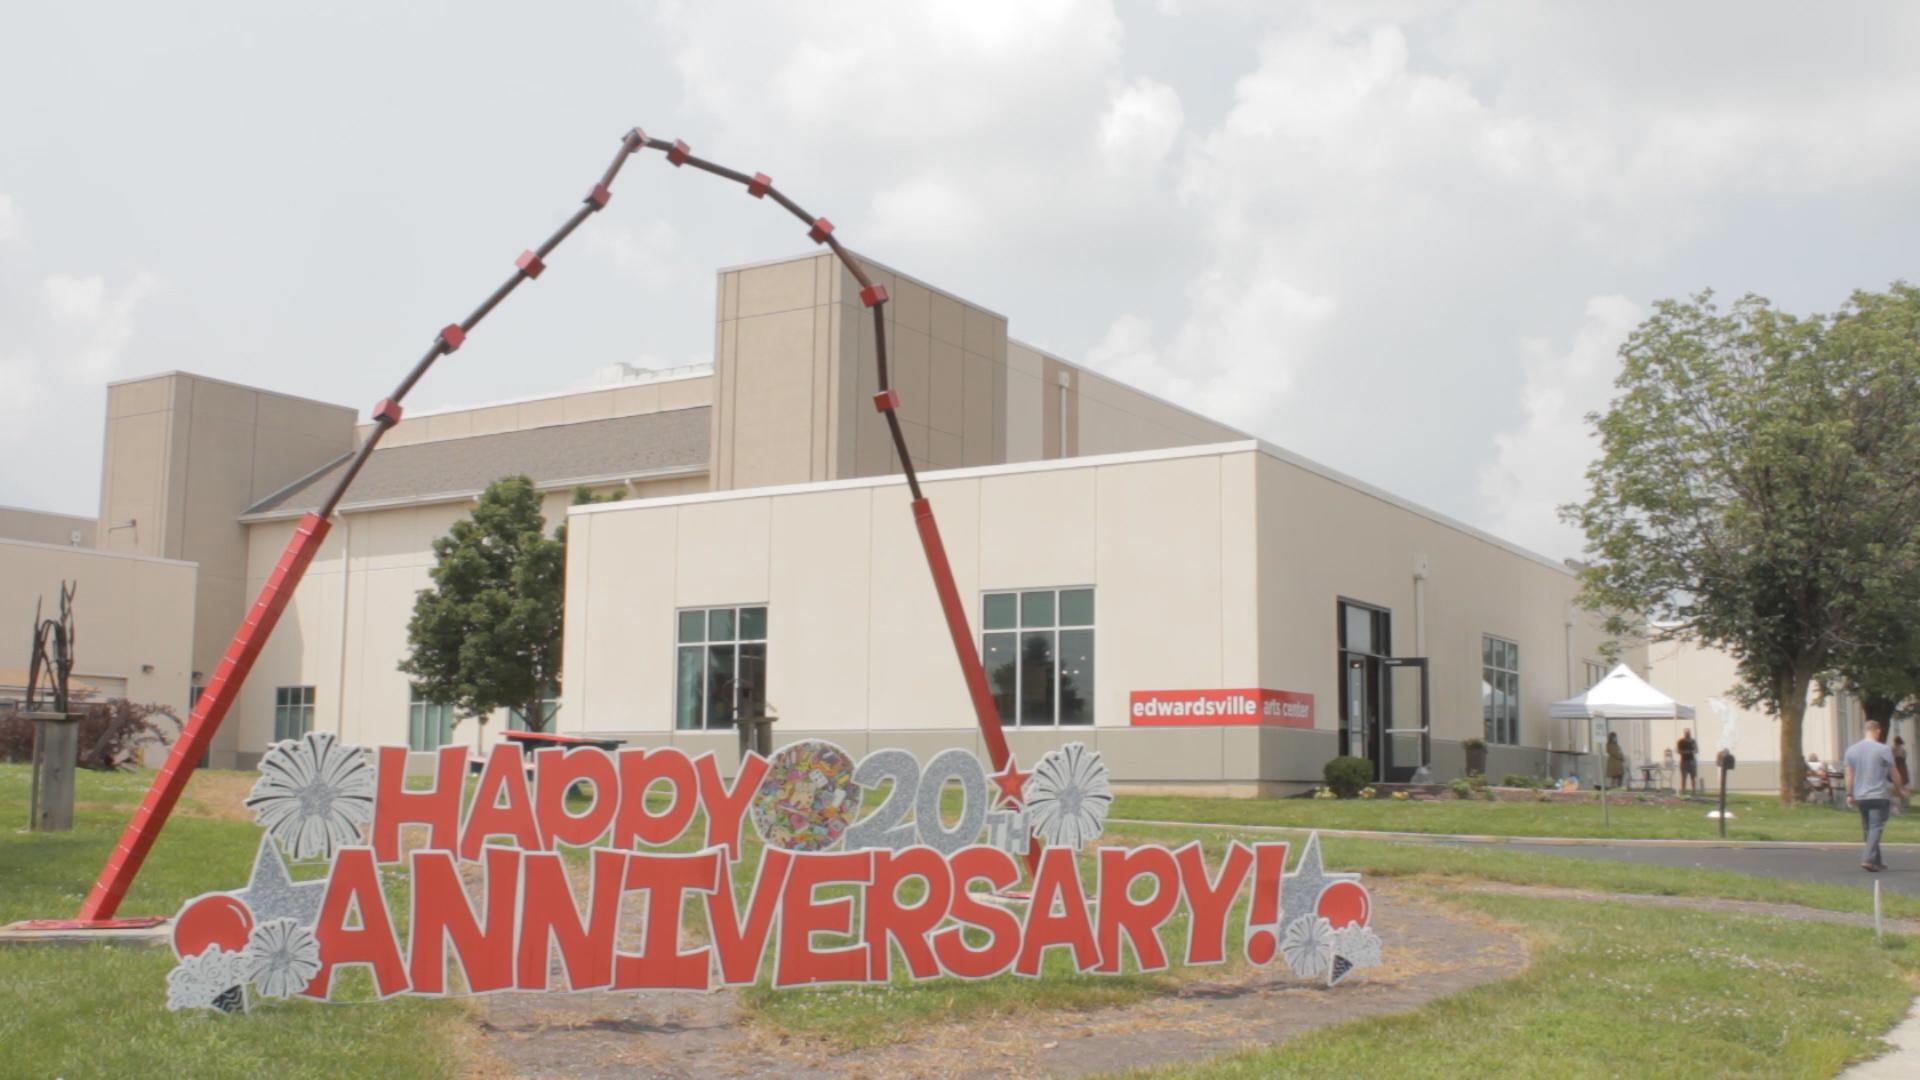 Edwardsville Arts Center Celebrates 20 Year Anniversary